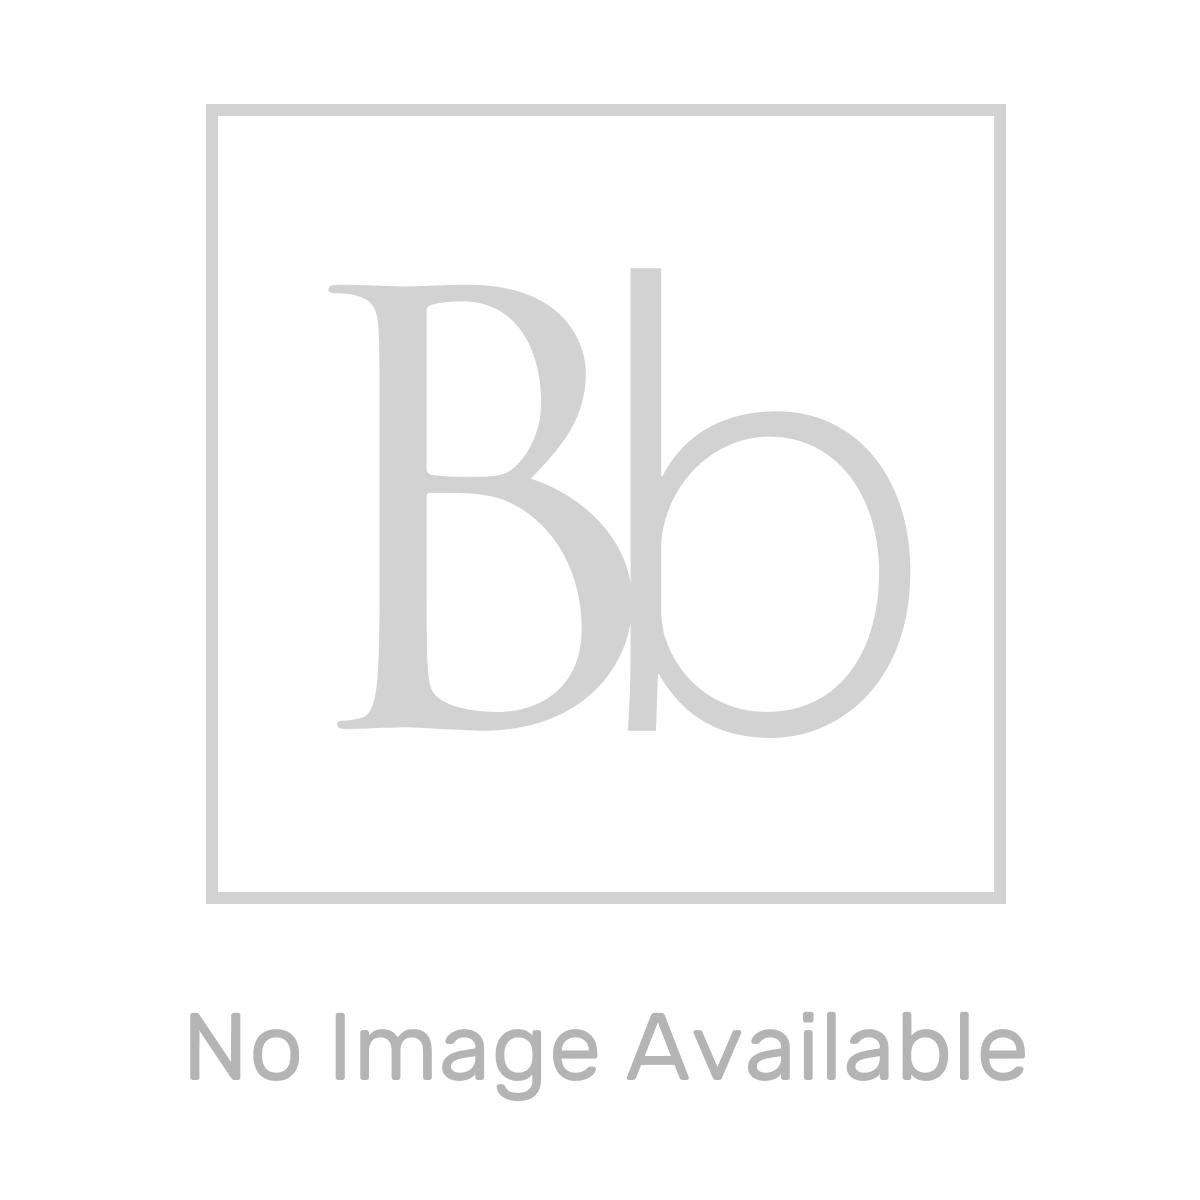 Aquadart Black Slate Shower Tray 1100 x 800 Lifestyle